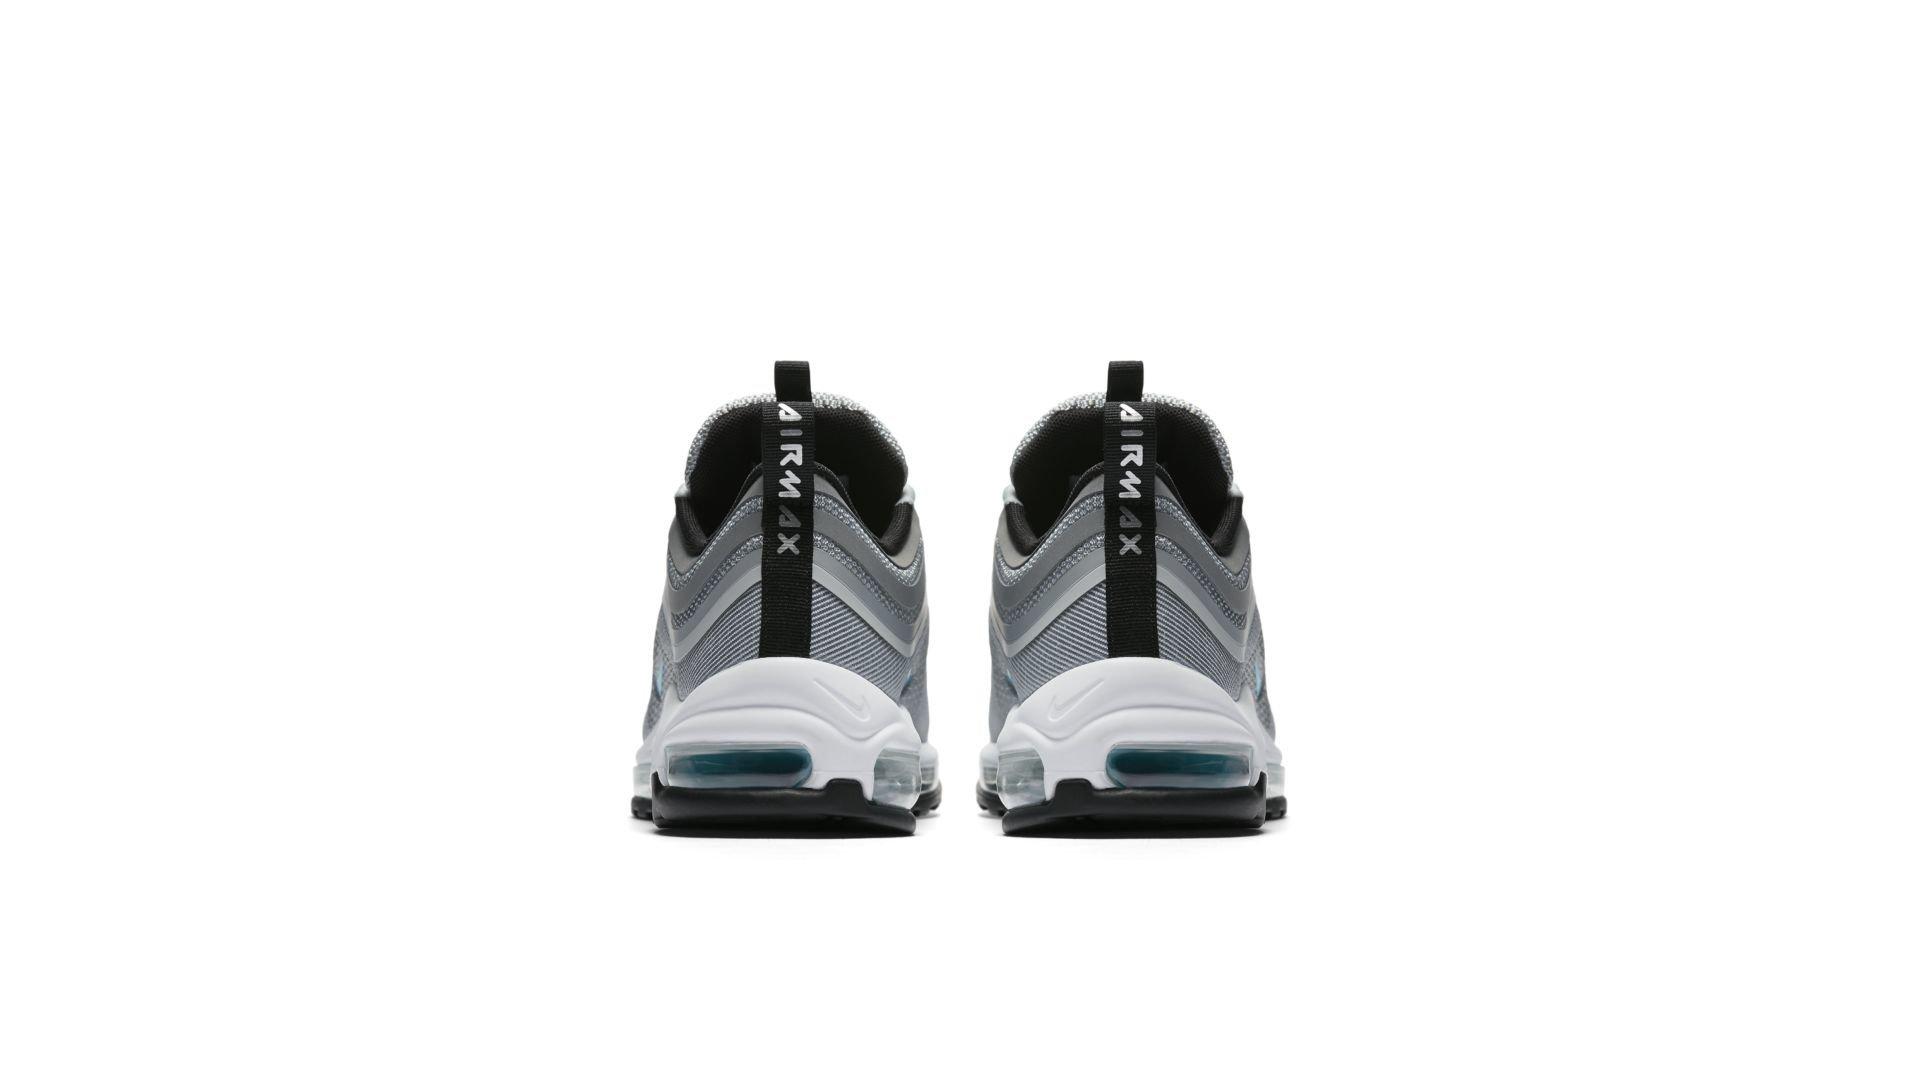 Nike Wmns Air Max 97 Ultra 17 Marina Blue (917704-001)